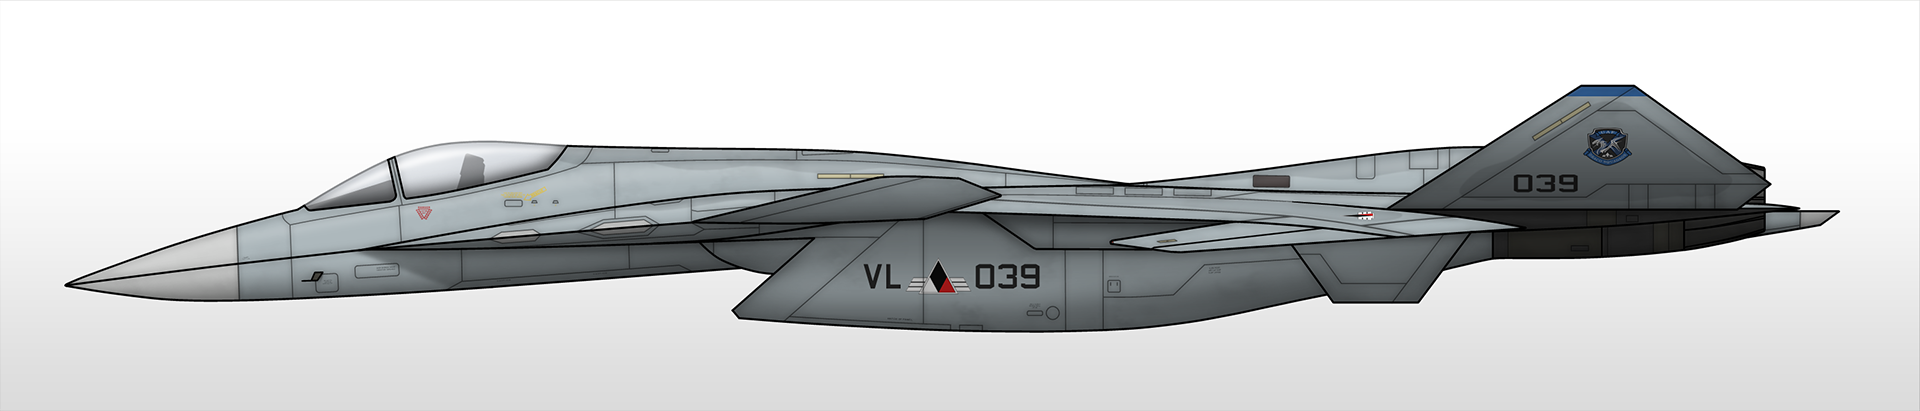 X-02A - Draco Squadron UAF by Jetfreak-7 on DeviantArt